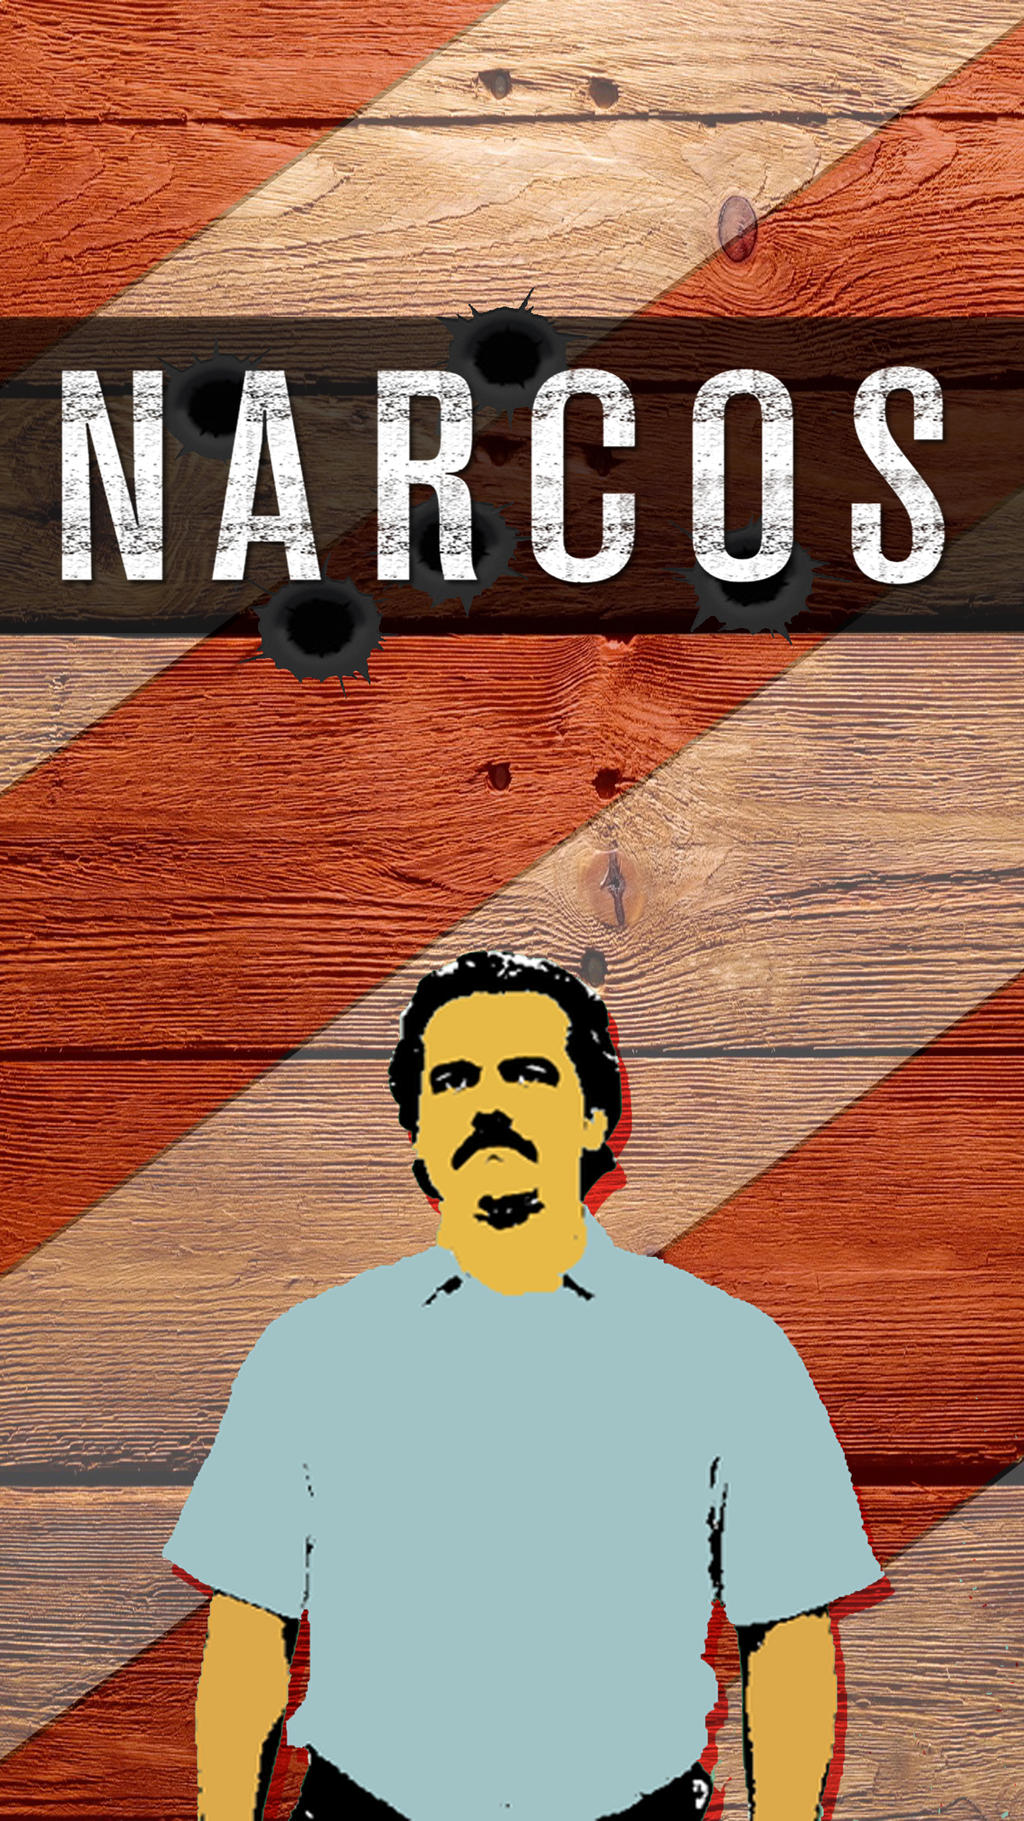 Narcos wallpaper v.2 by Puebloz on